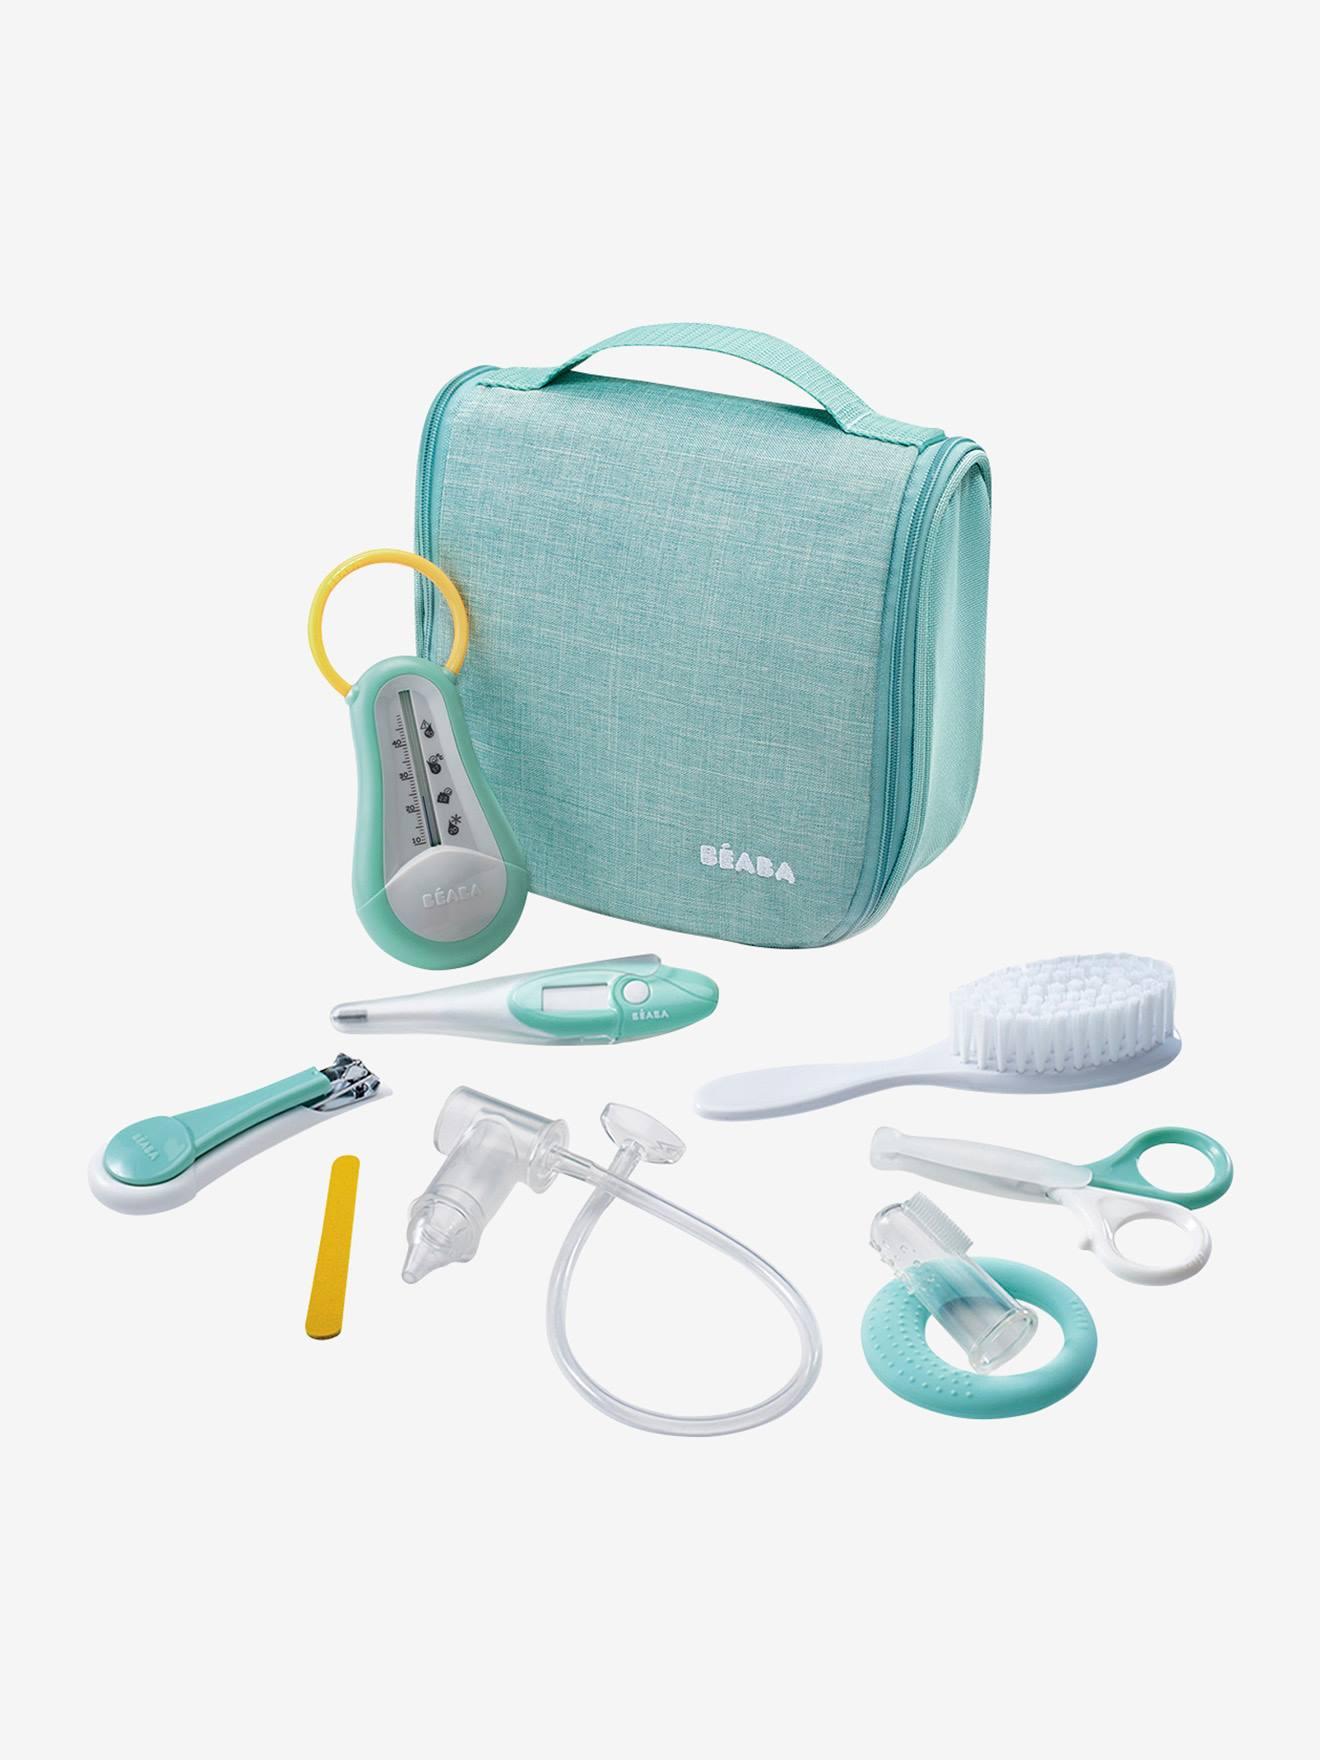 Bolsa para cuidados de higiene, 9 acessórios, da BEABA verde medio mesclado